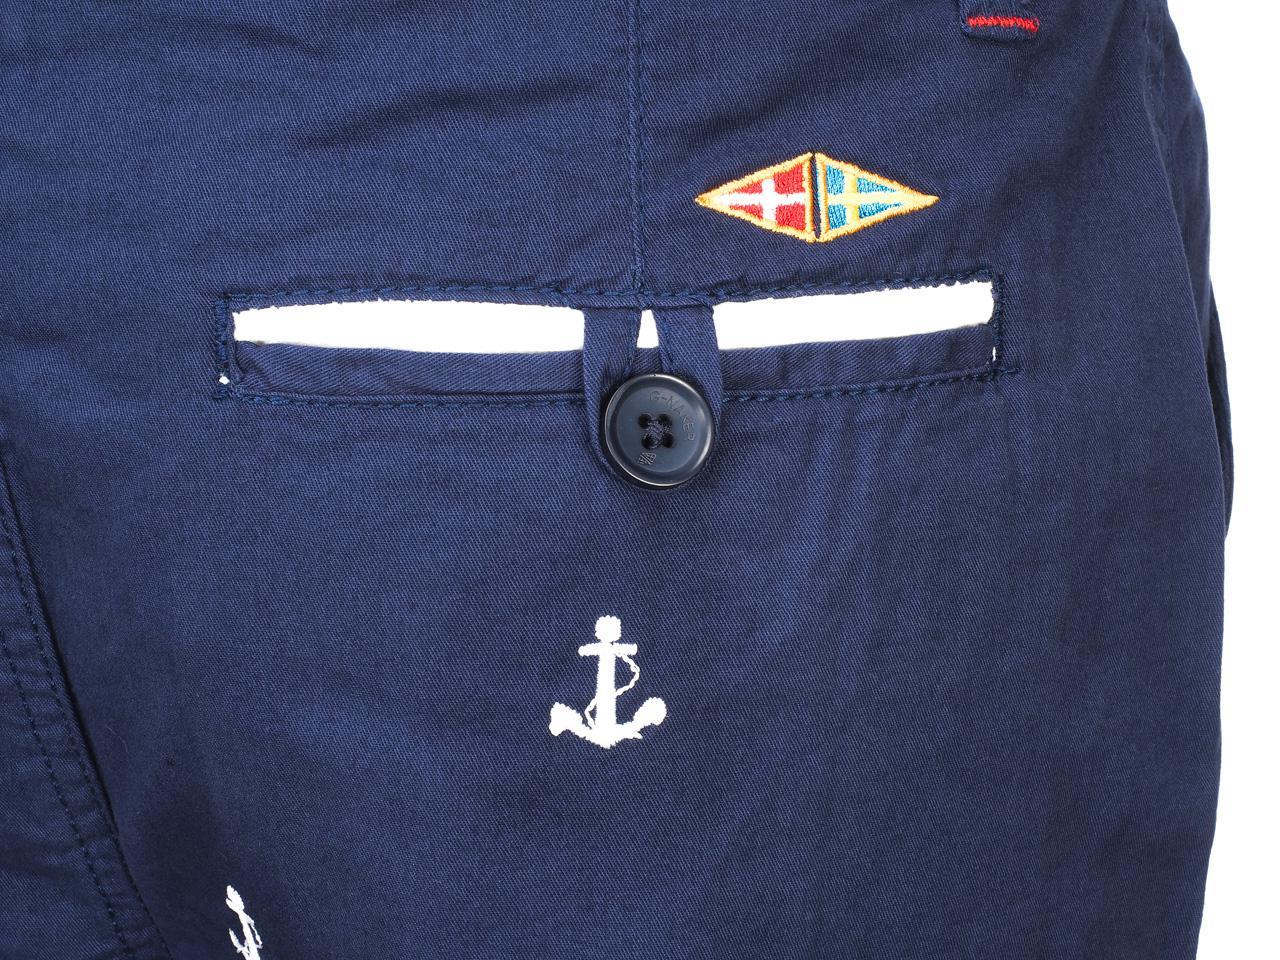 Bermuda-Shorts-G-naker-Mirbel-Navy-Bermuda-Blue-53397-New thumbnail 4